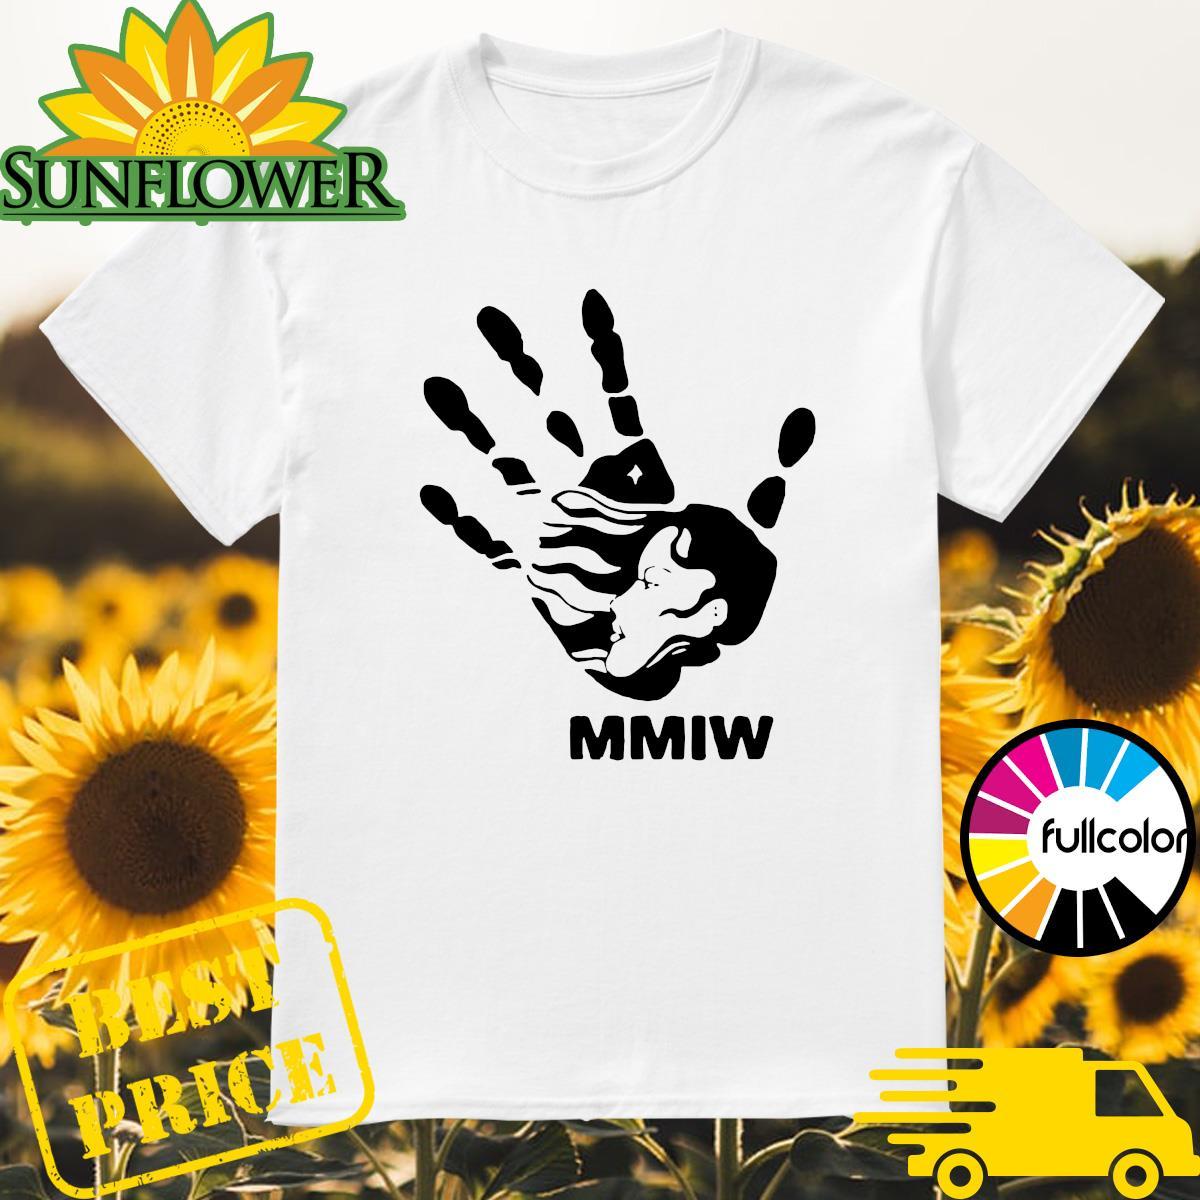 MMIW blood hand sign shirt